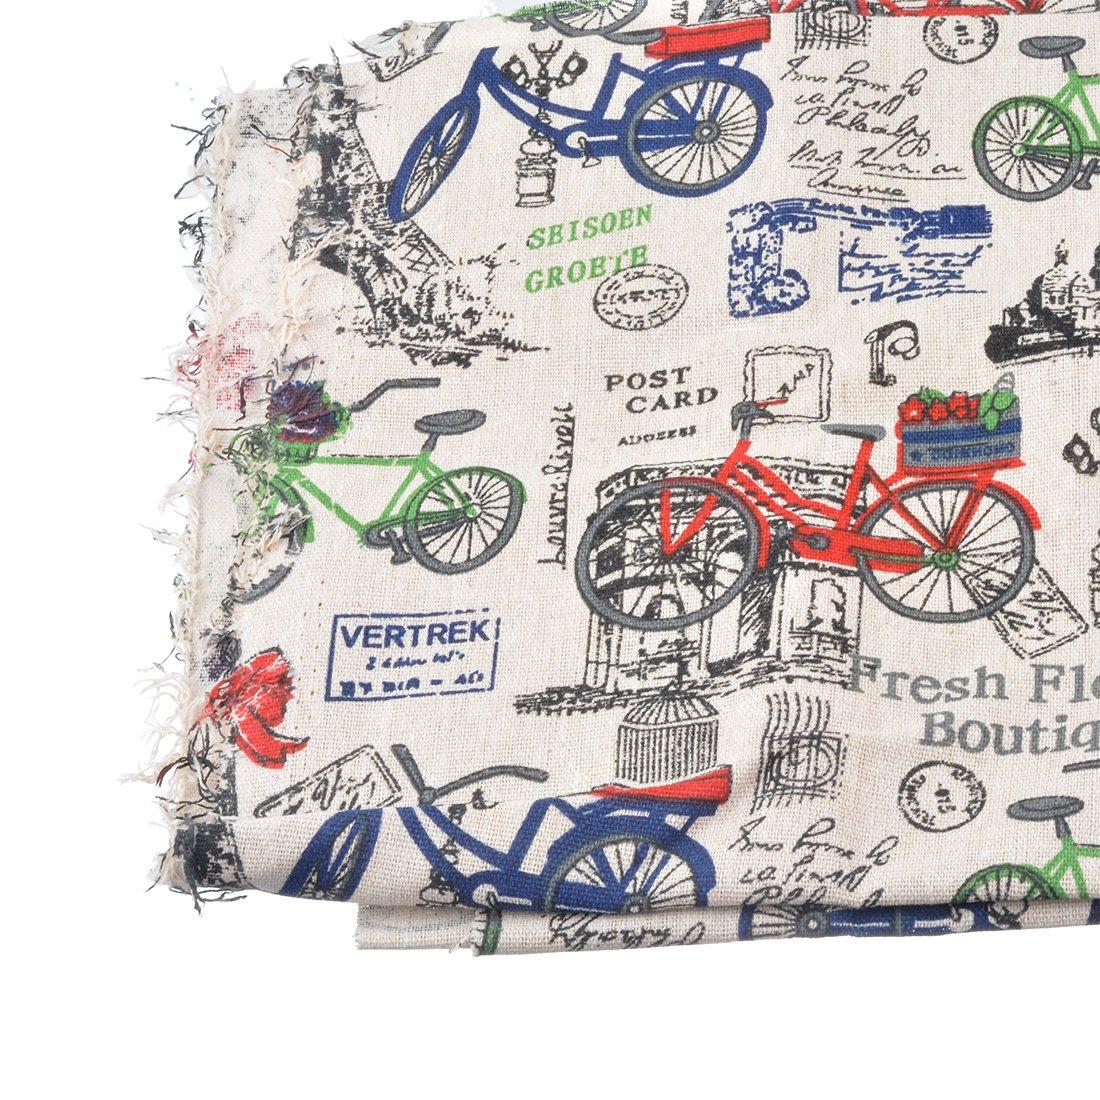 RainBabe Tissu Coton Bricolage DIY Patchwork Artisanat Couture Bicyclette 100cmx50cm